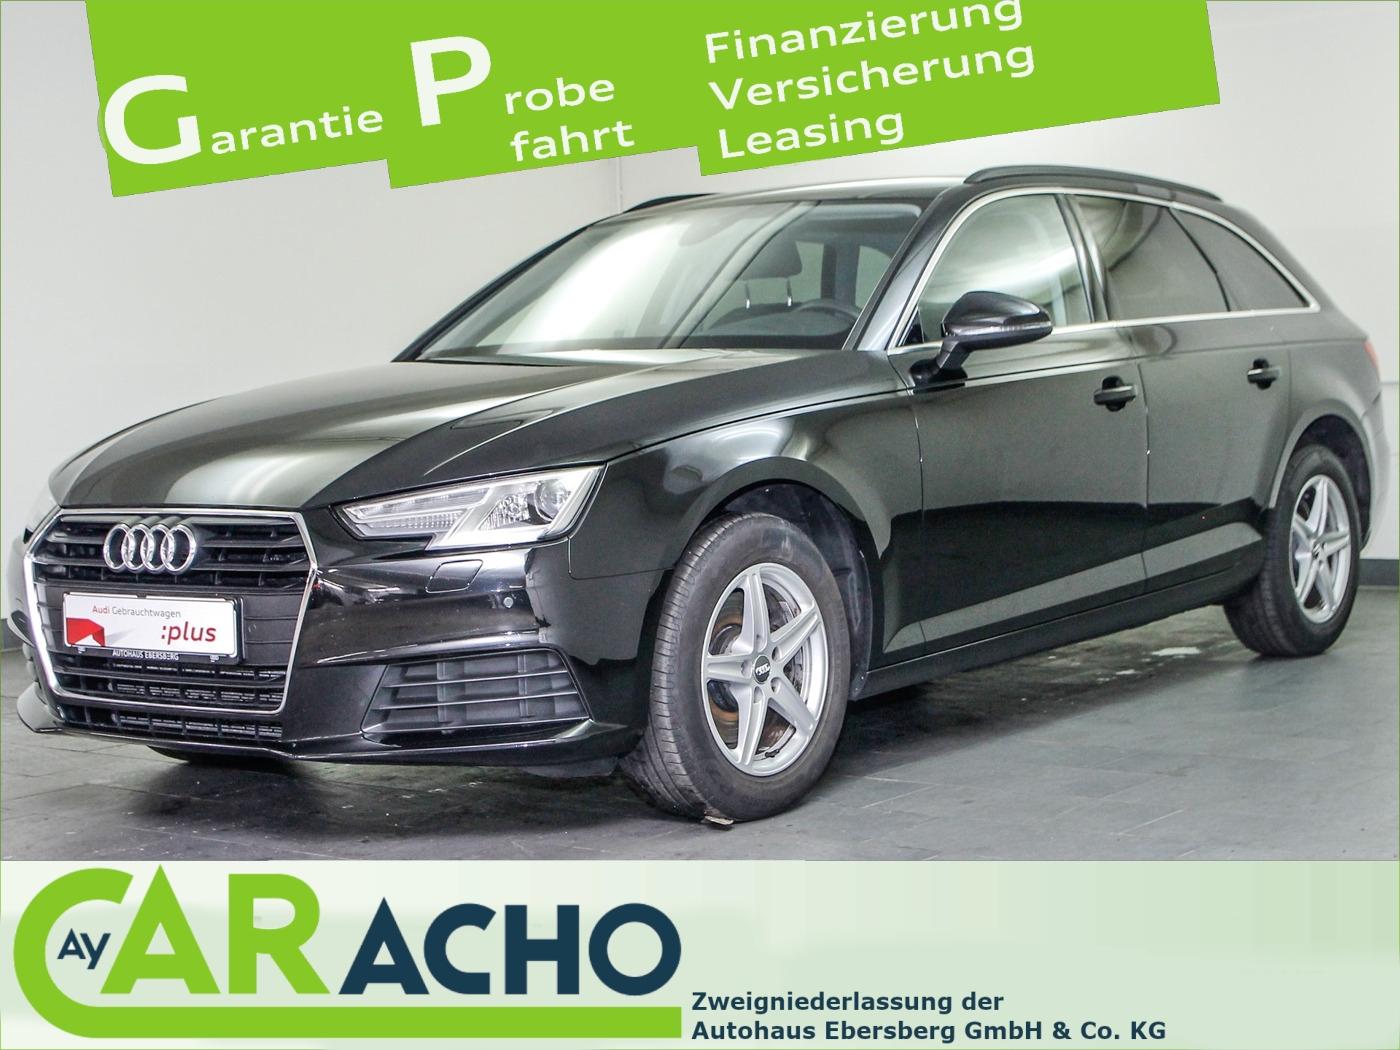 Audi A4 Avant 2.0 TDI QI PDC Xen Nav SHZ connect LTE, Jahr 2018, Diesel